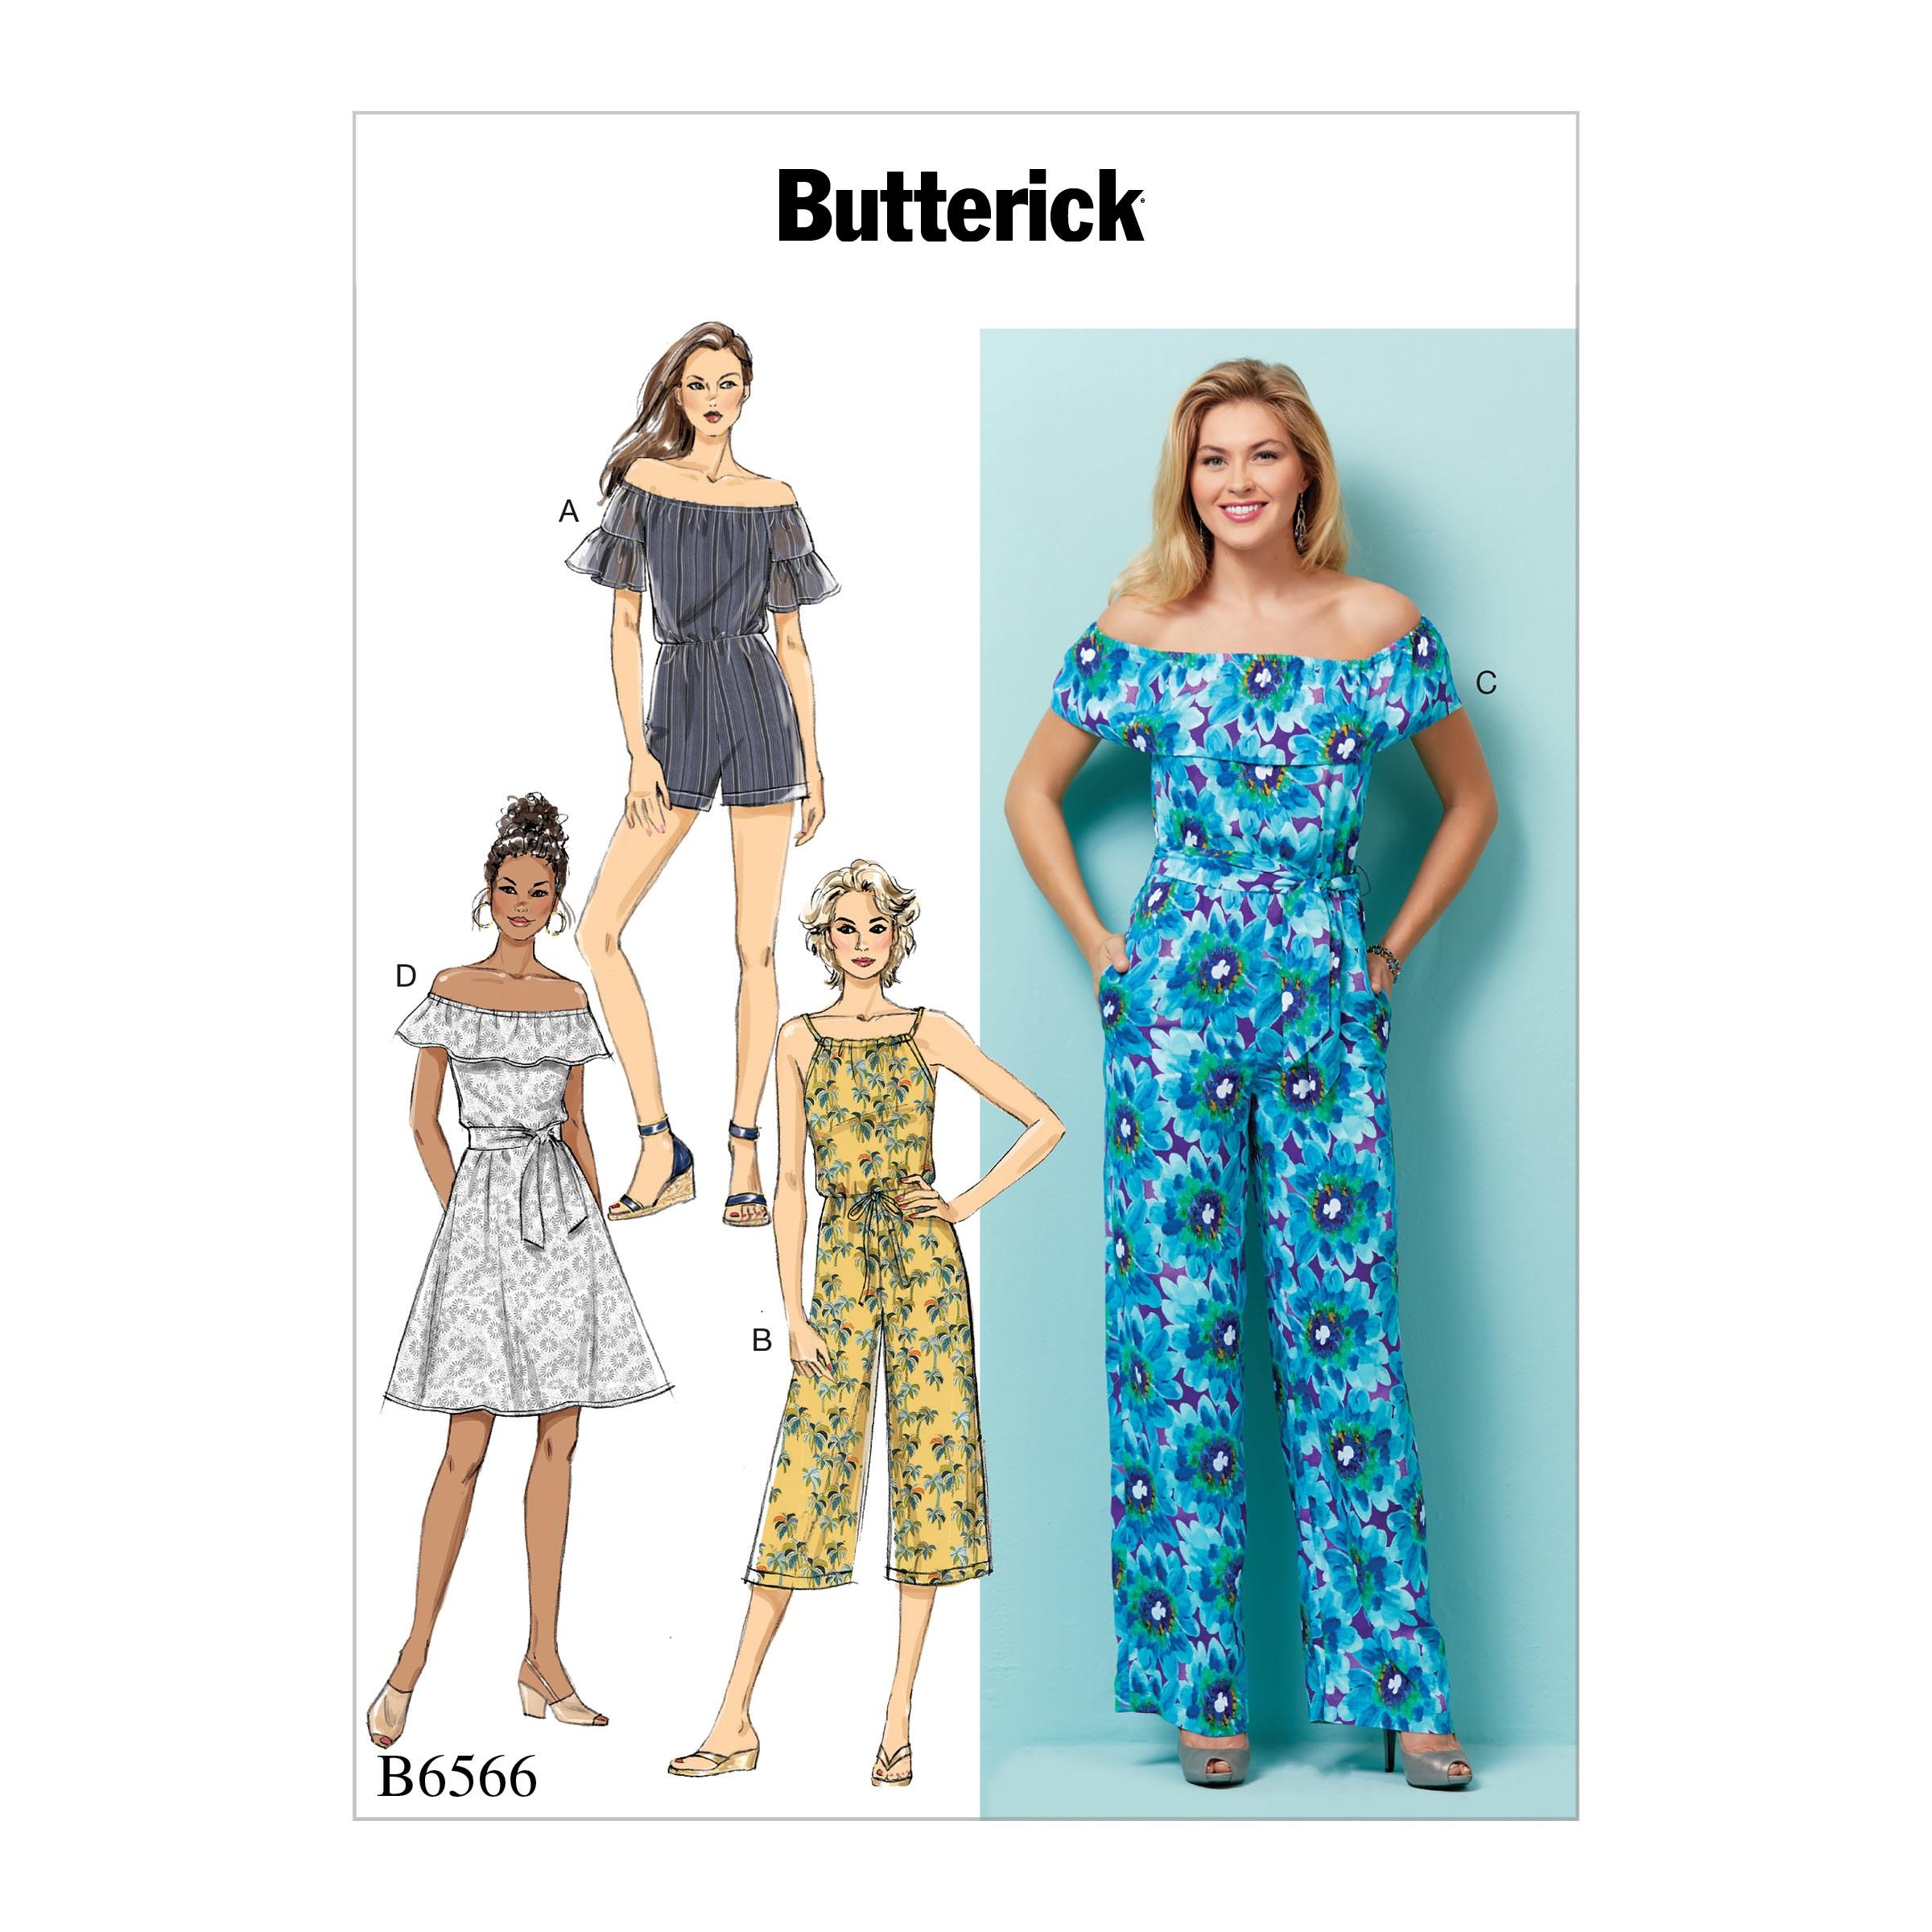 Butterick Sewing Pattern 6566 Misses' / Misses Petite Dress, Rhomper or Playsuit